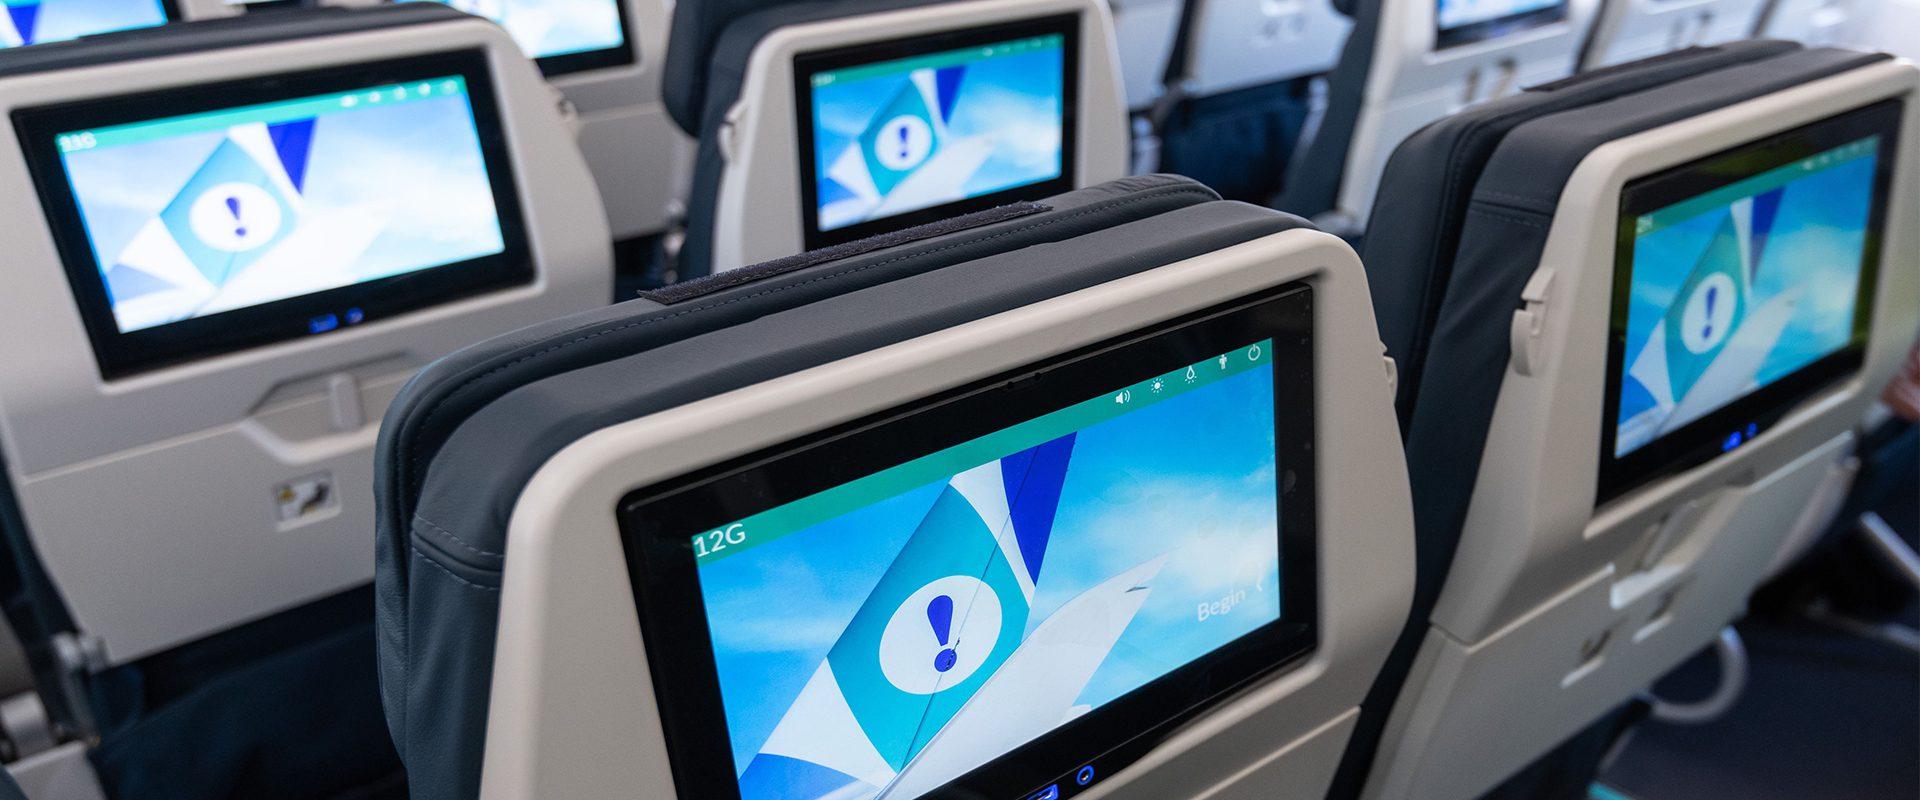 Sistema entretenimiento A350 Evelop!